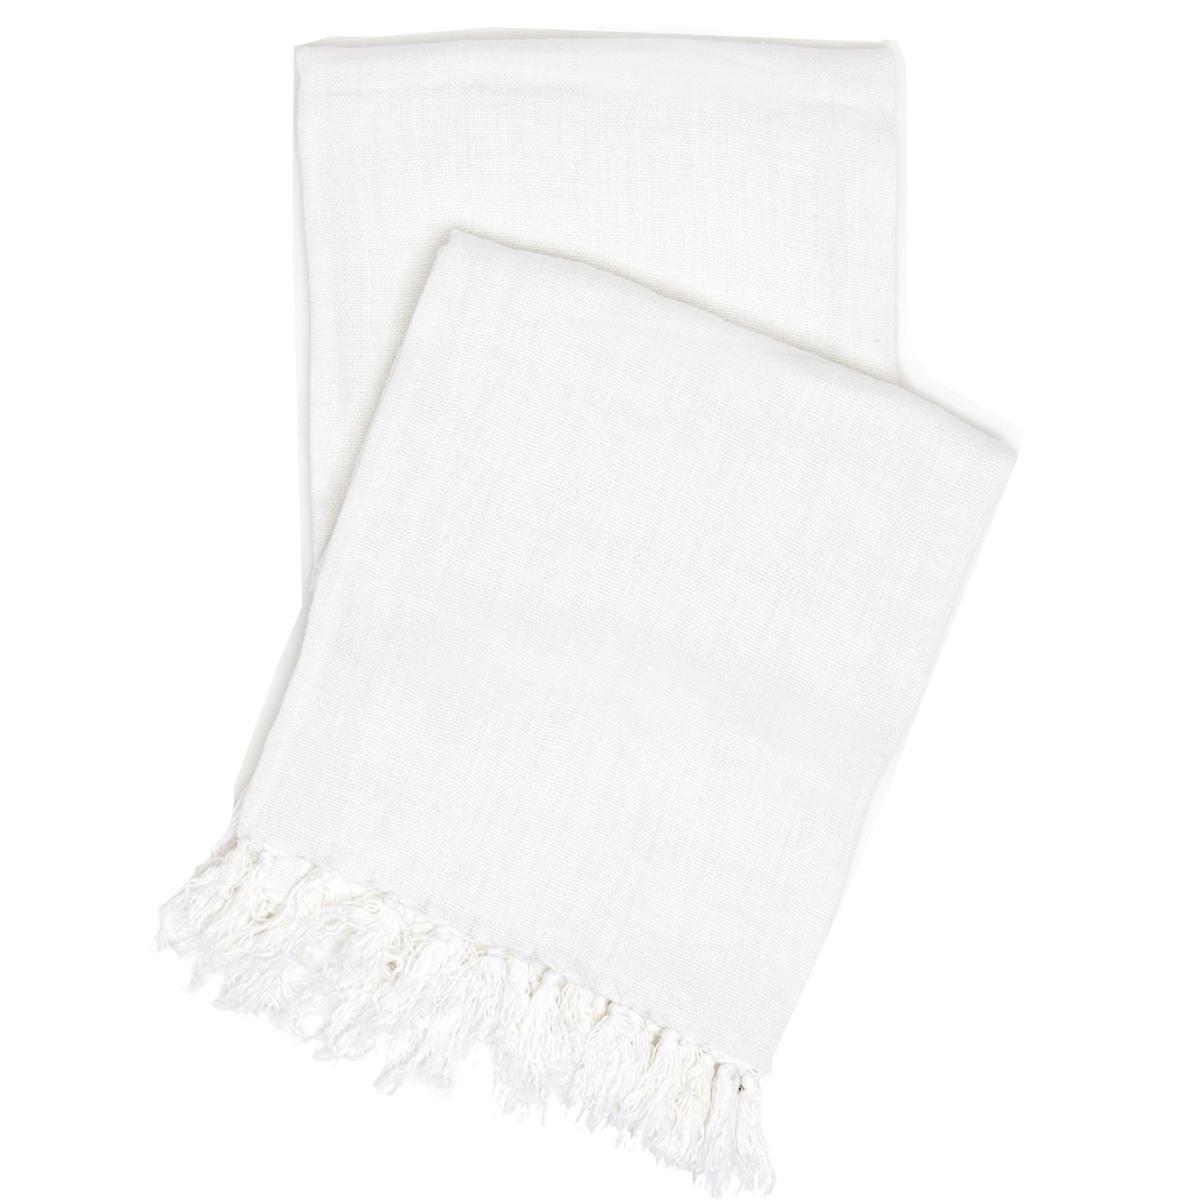 Laundered Linen White Throw